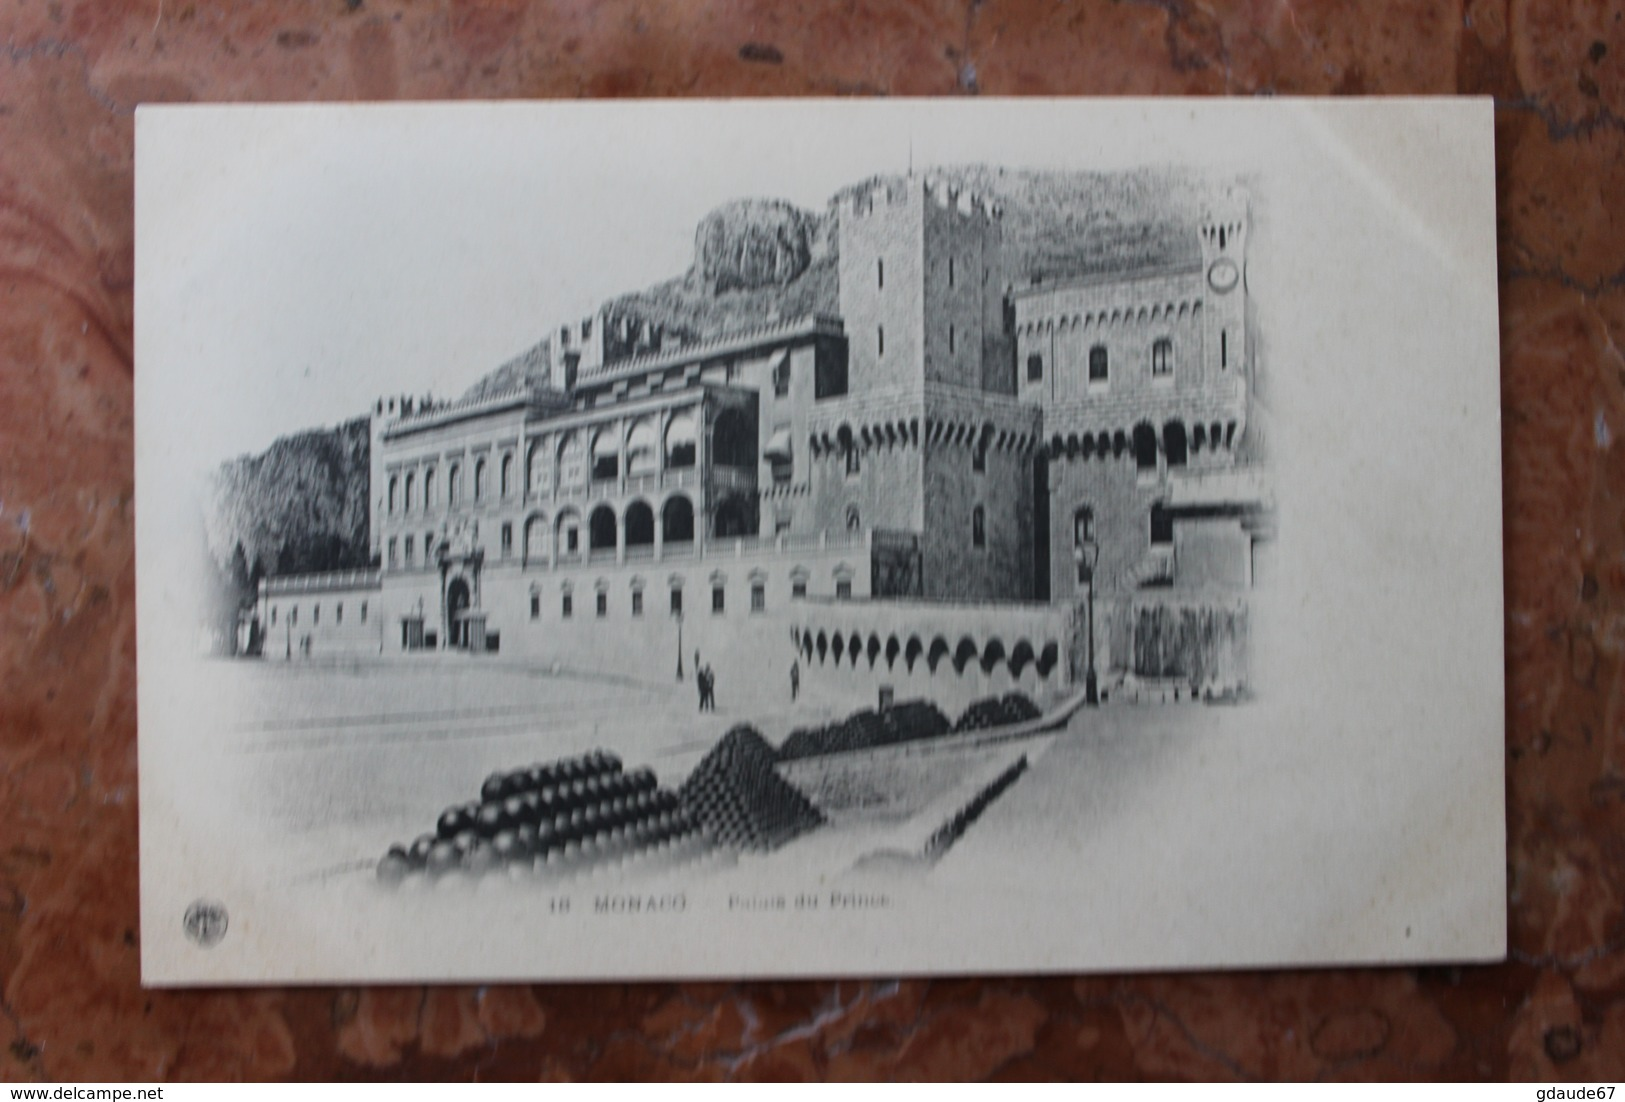 MONACO - PALAIS DU PRINCE - Palais Princier